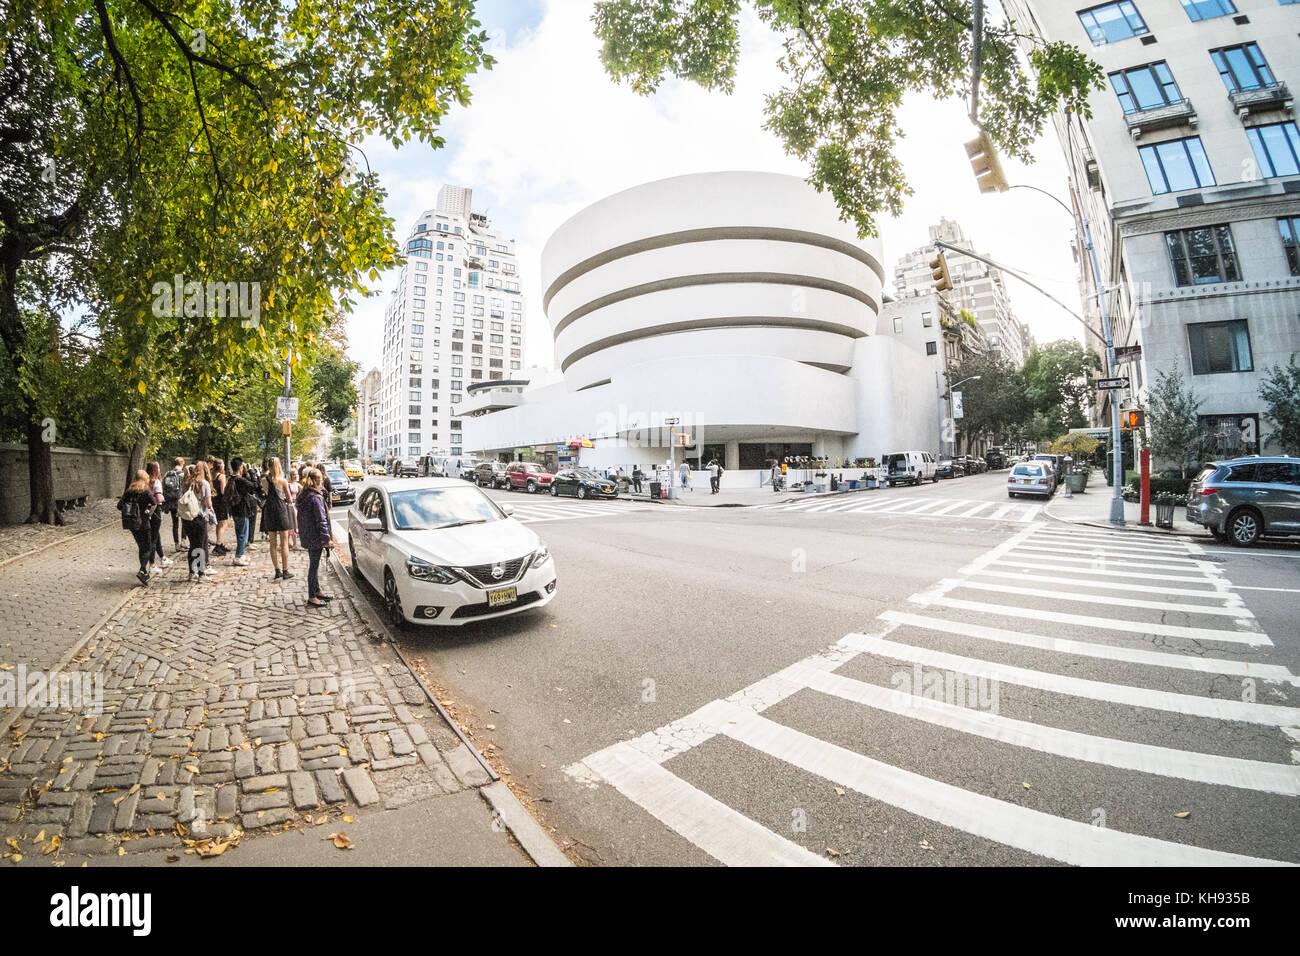 Salomo. Guggenheim Museum, 5th Avenue, Manhattan, New York City, NY, Vereinigte Staaten von Amerika. Usa Stockbild